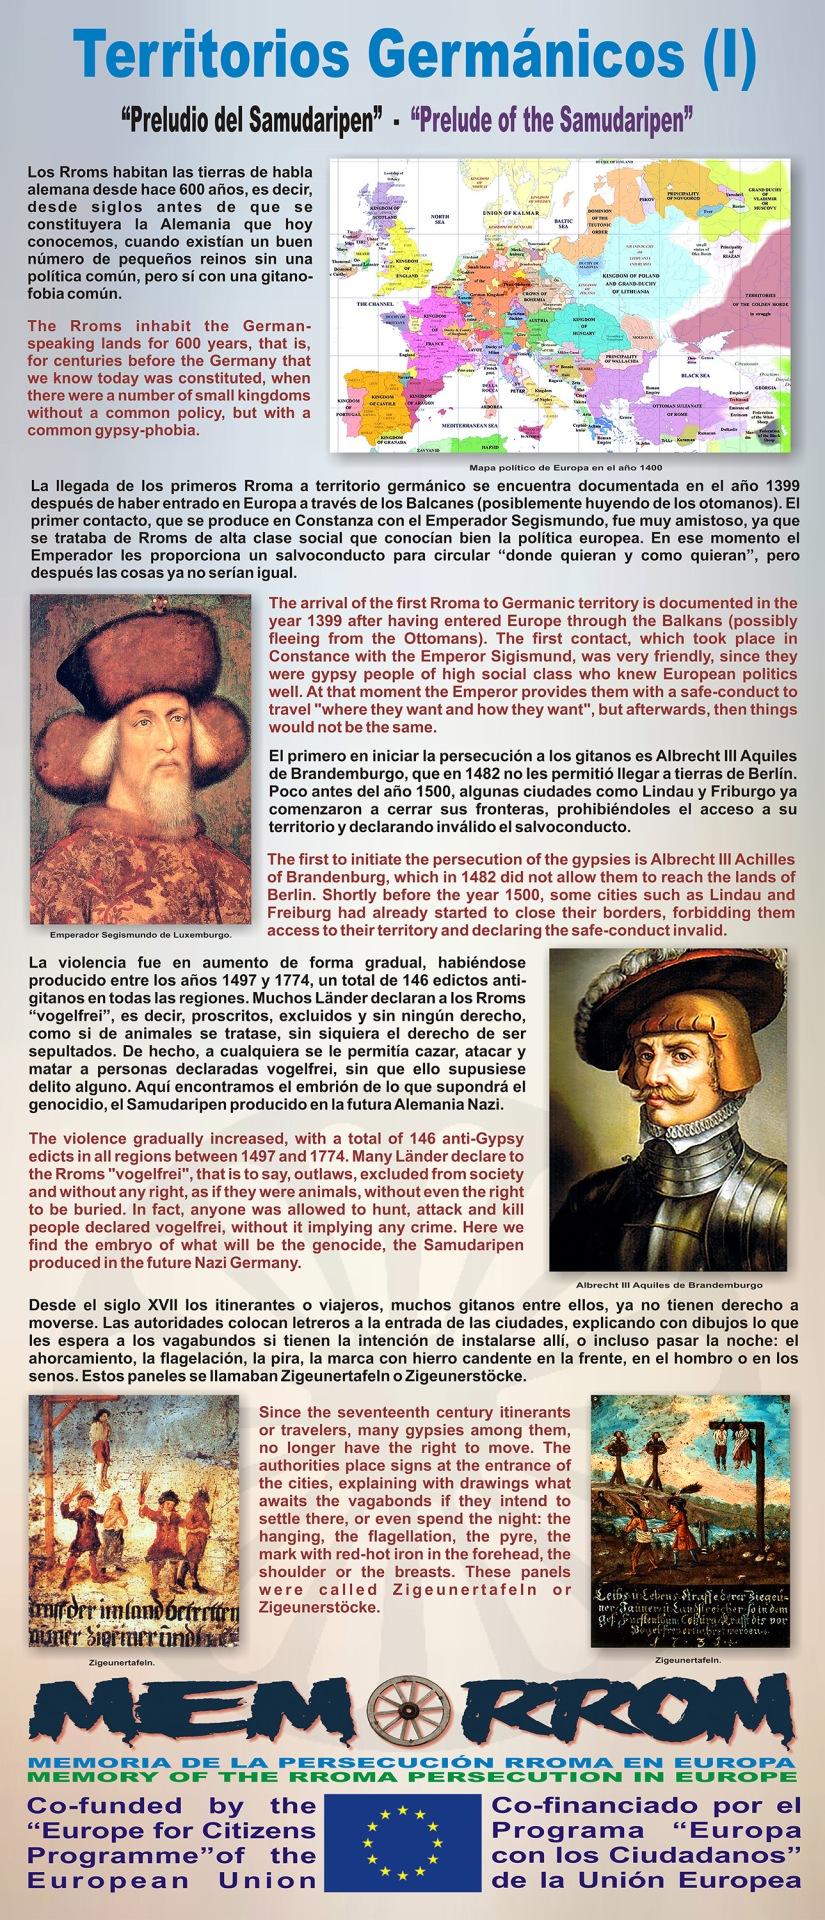 TERRITORIOS GERMÁNICOS I